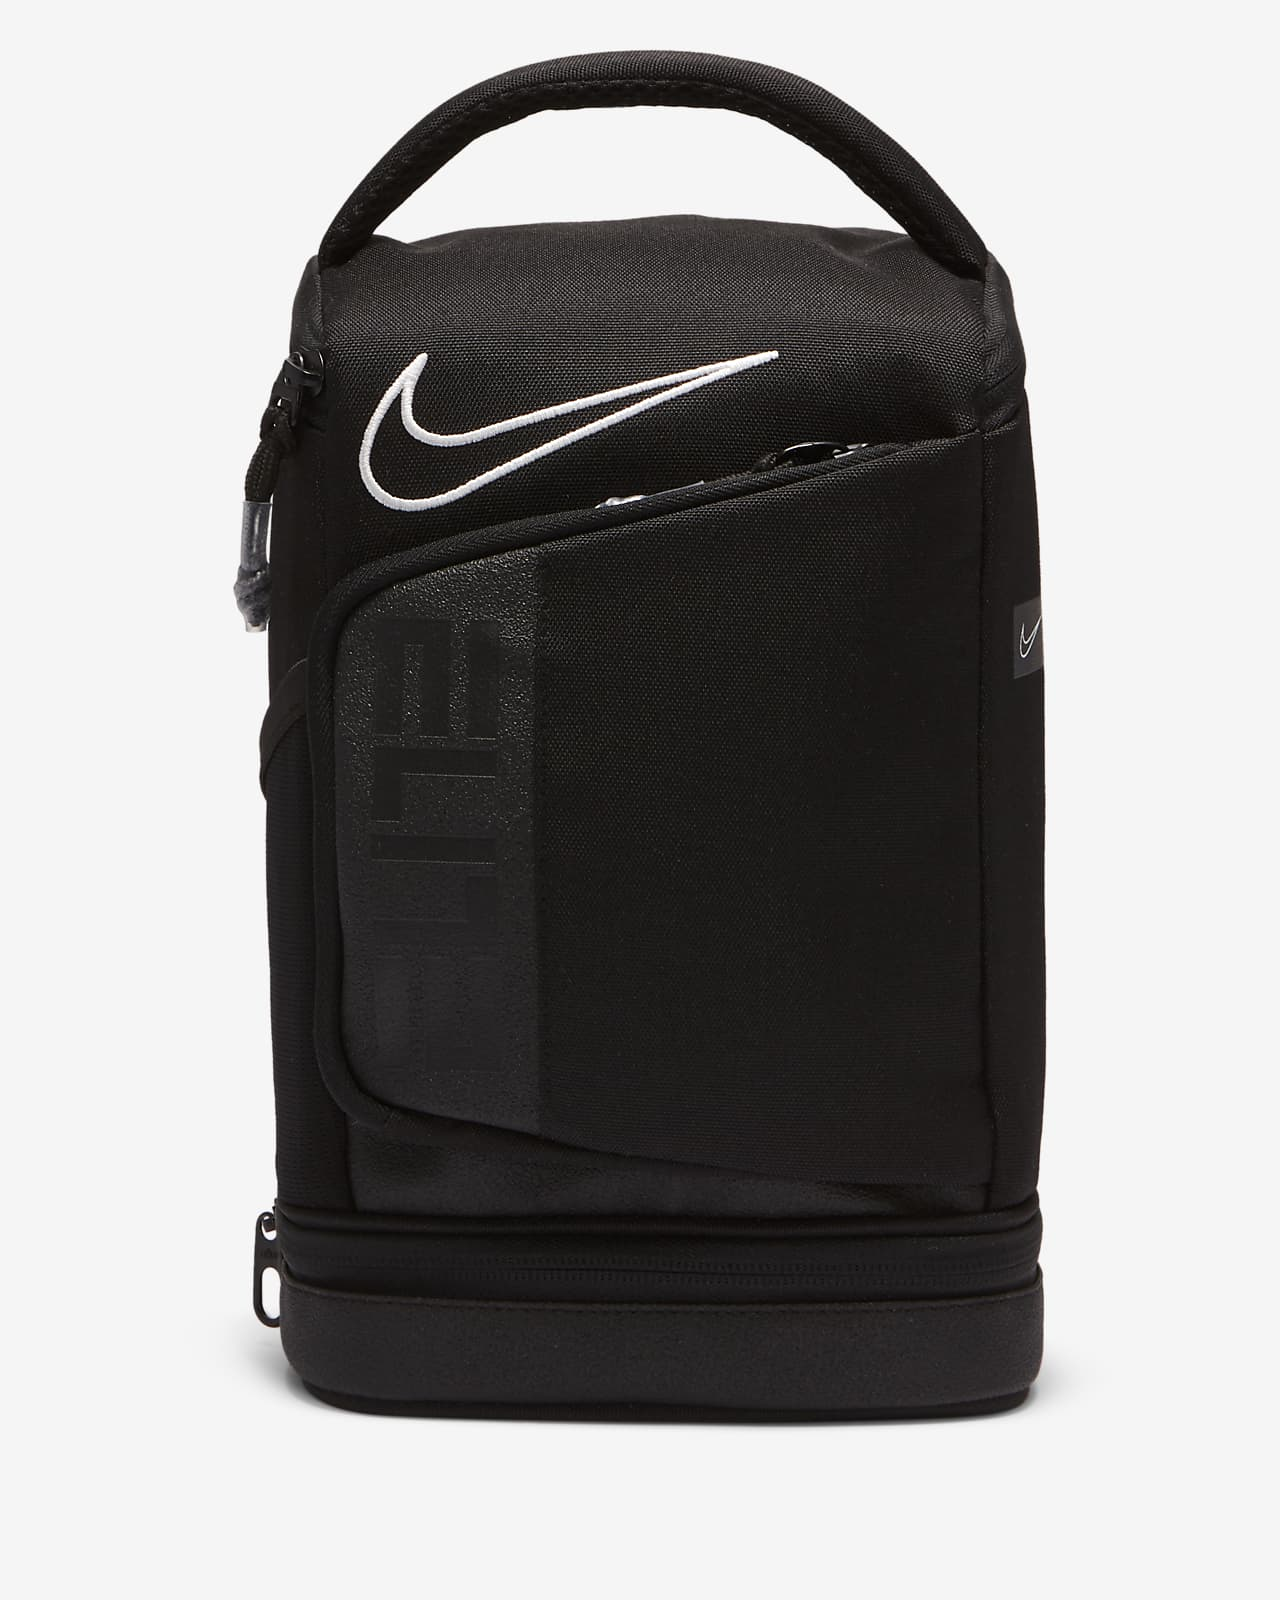 Nike Elite Fuel Pack Lunch Bag